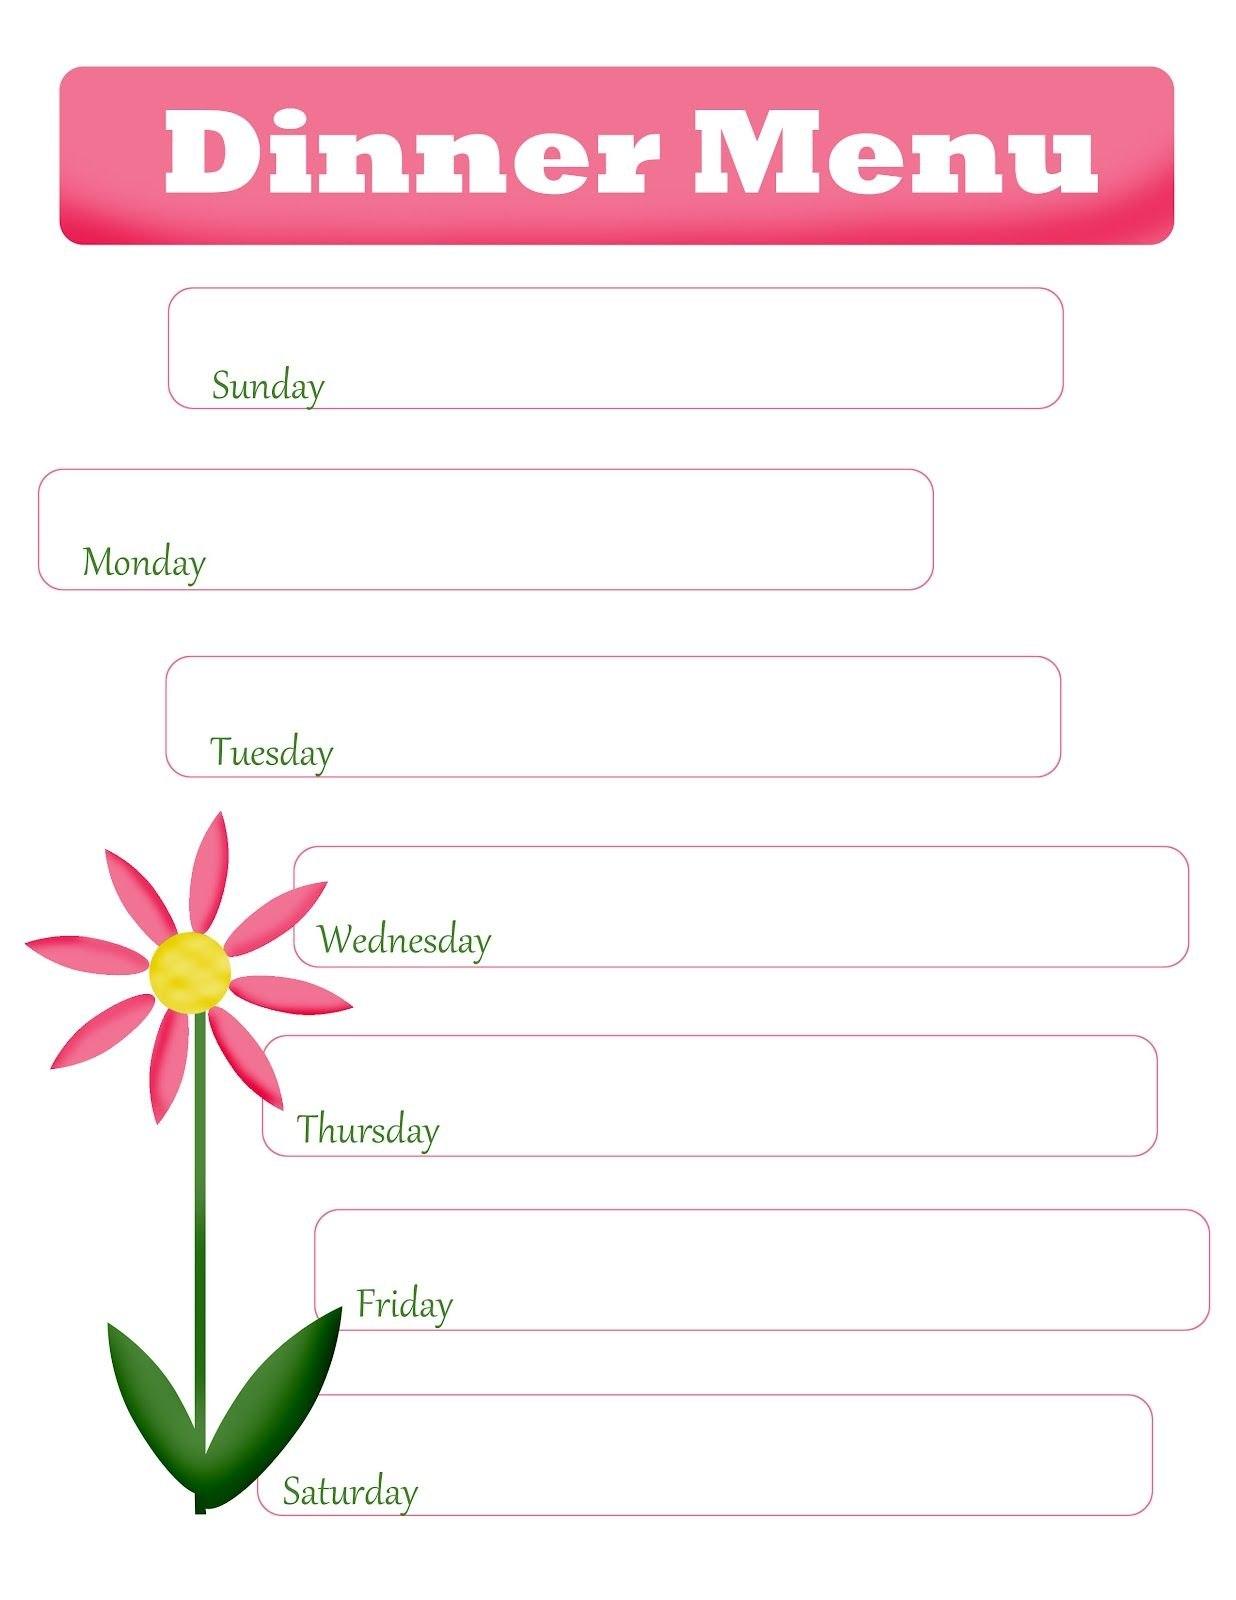 Mom's Menu Planning Free Printable Blank Dinner Menu  Spring With Blank Dinner Menu Template